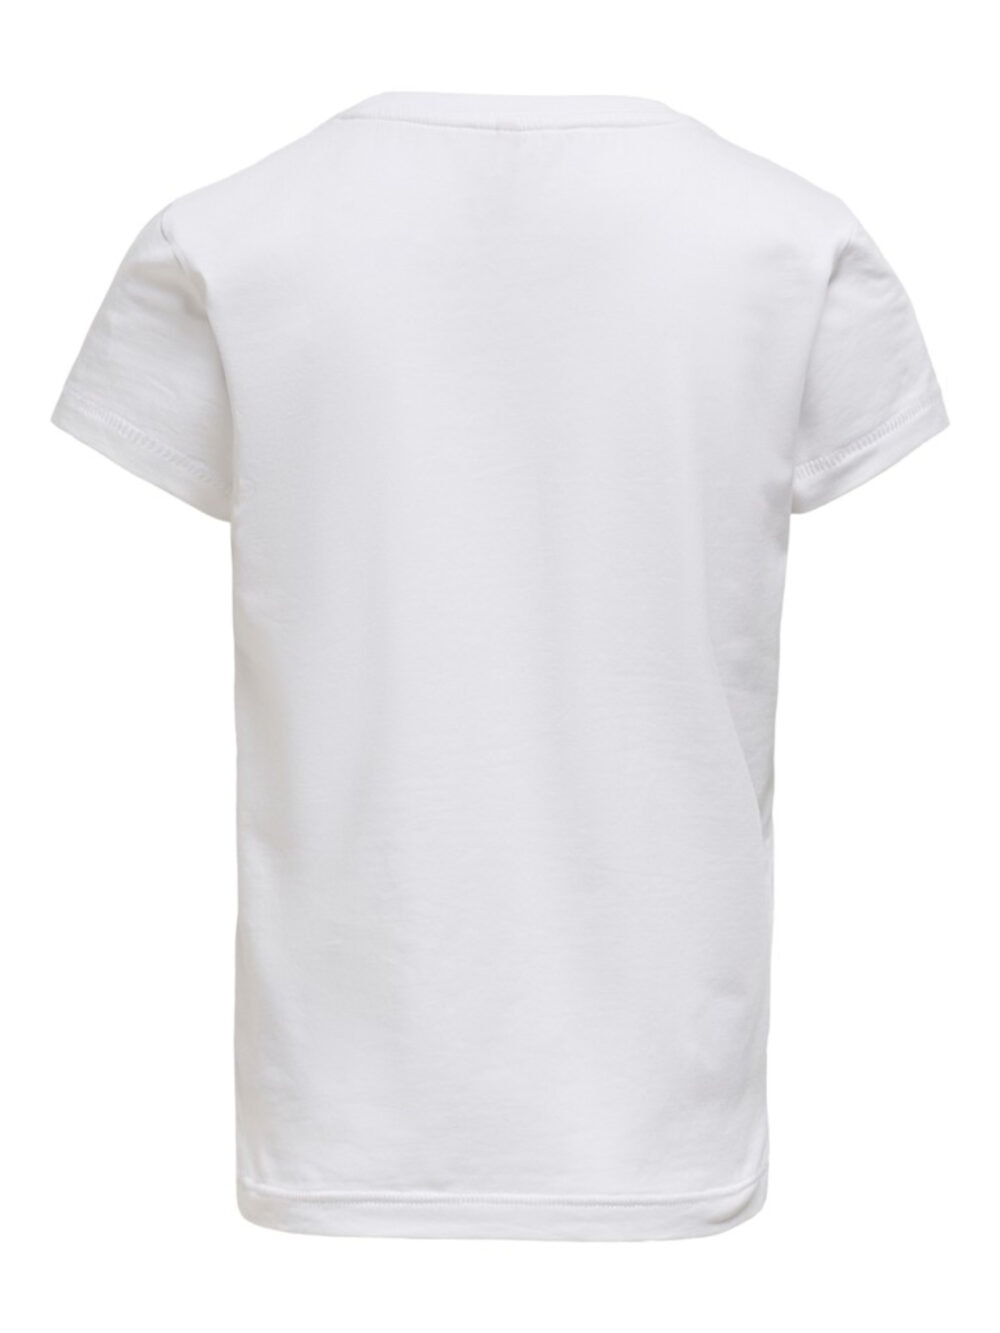 Kids Only Konlux Life T-shirt Bright White